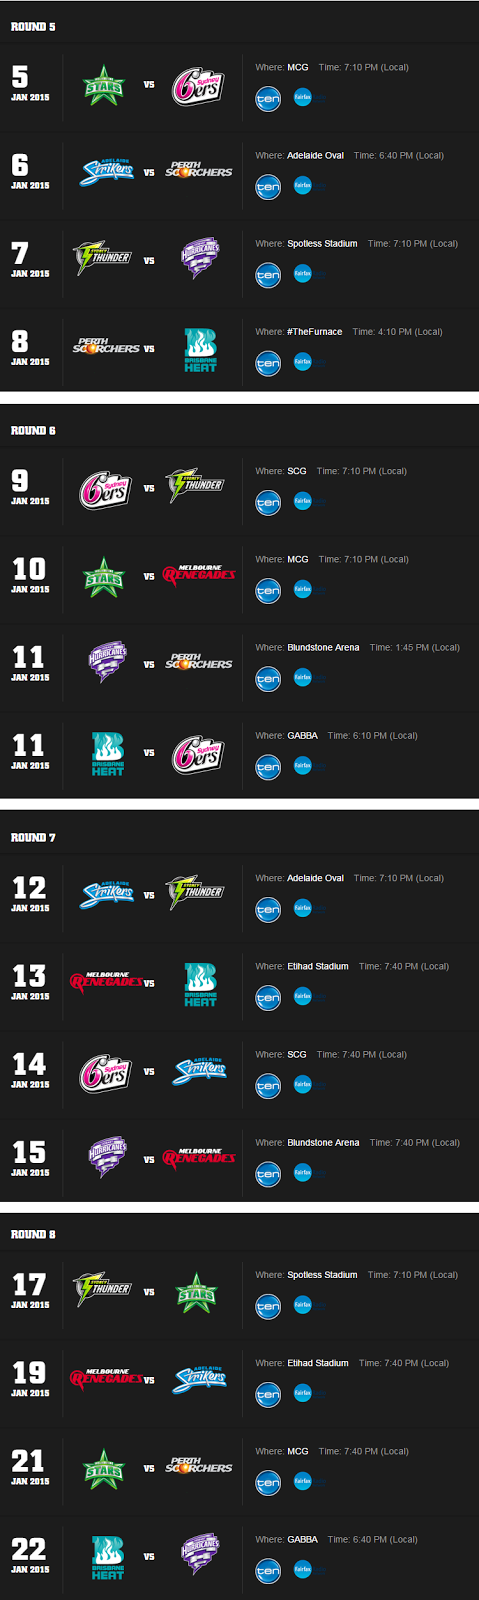 KFC-Big-Bash-2014-2015-Twenty20-Cricket-rounds